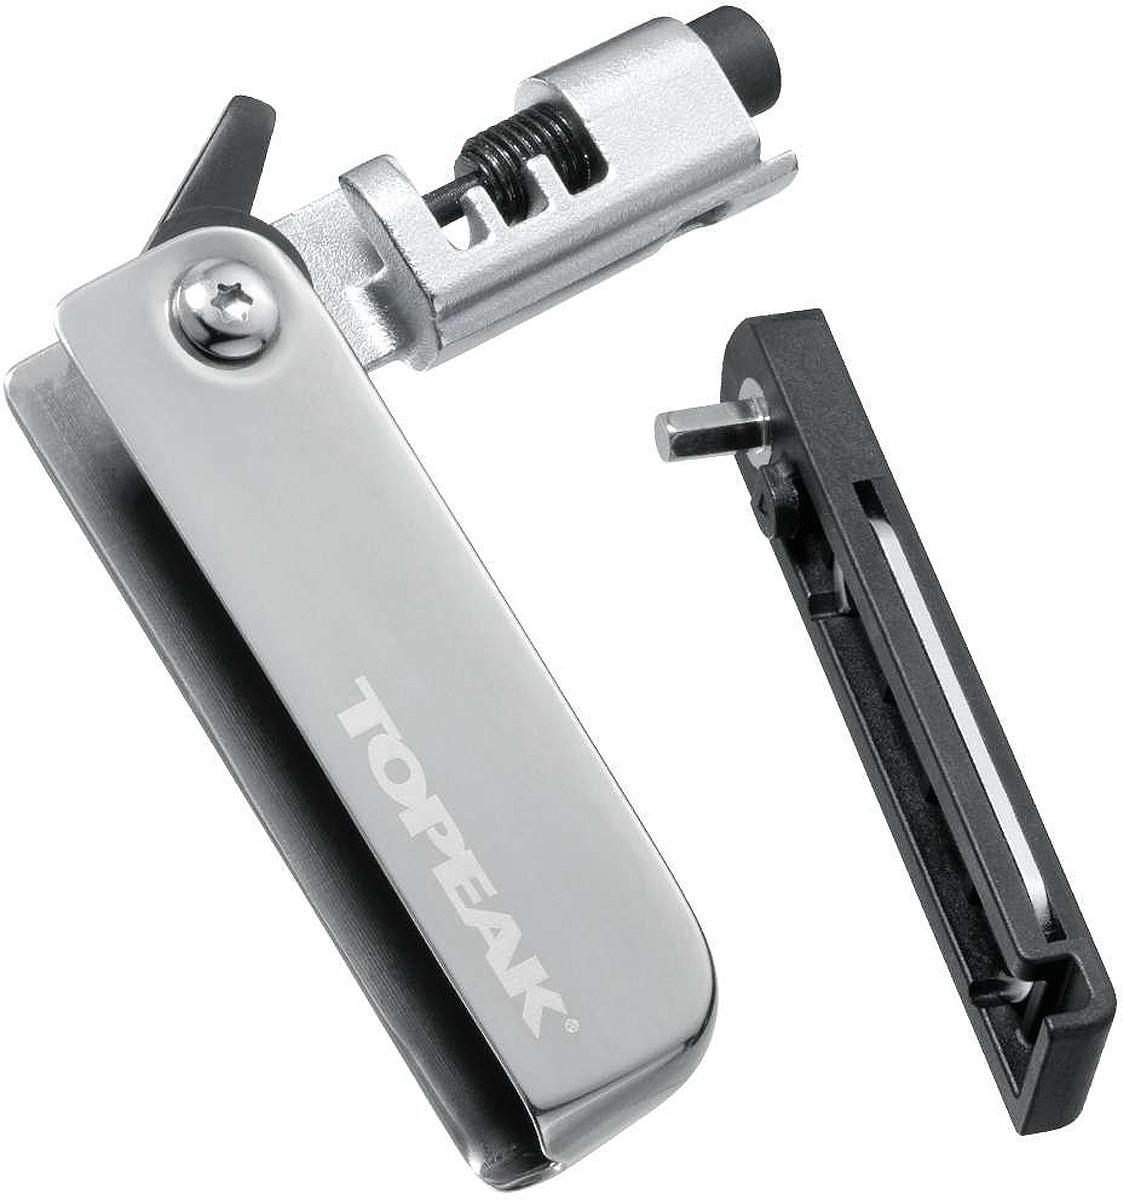 Выжимка цепи Topeak Link 11 Folding Chain Tool, TT2548, черный